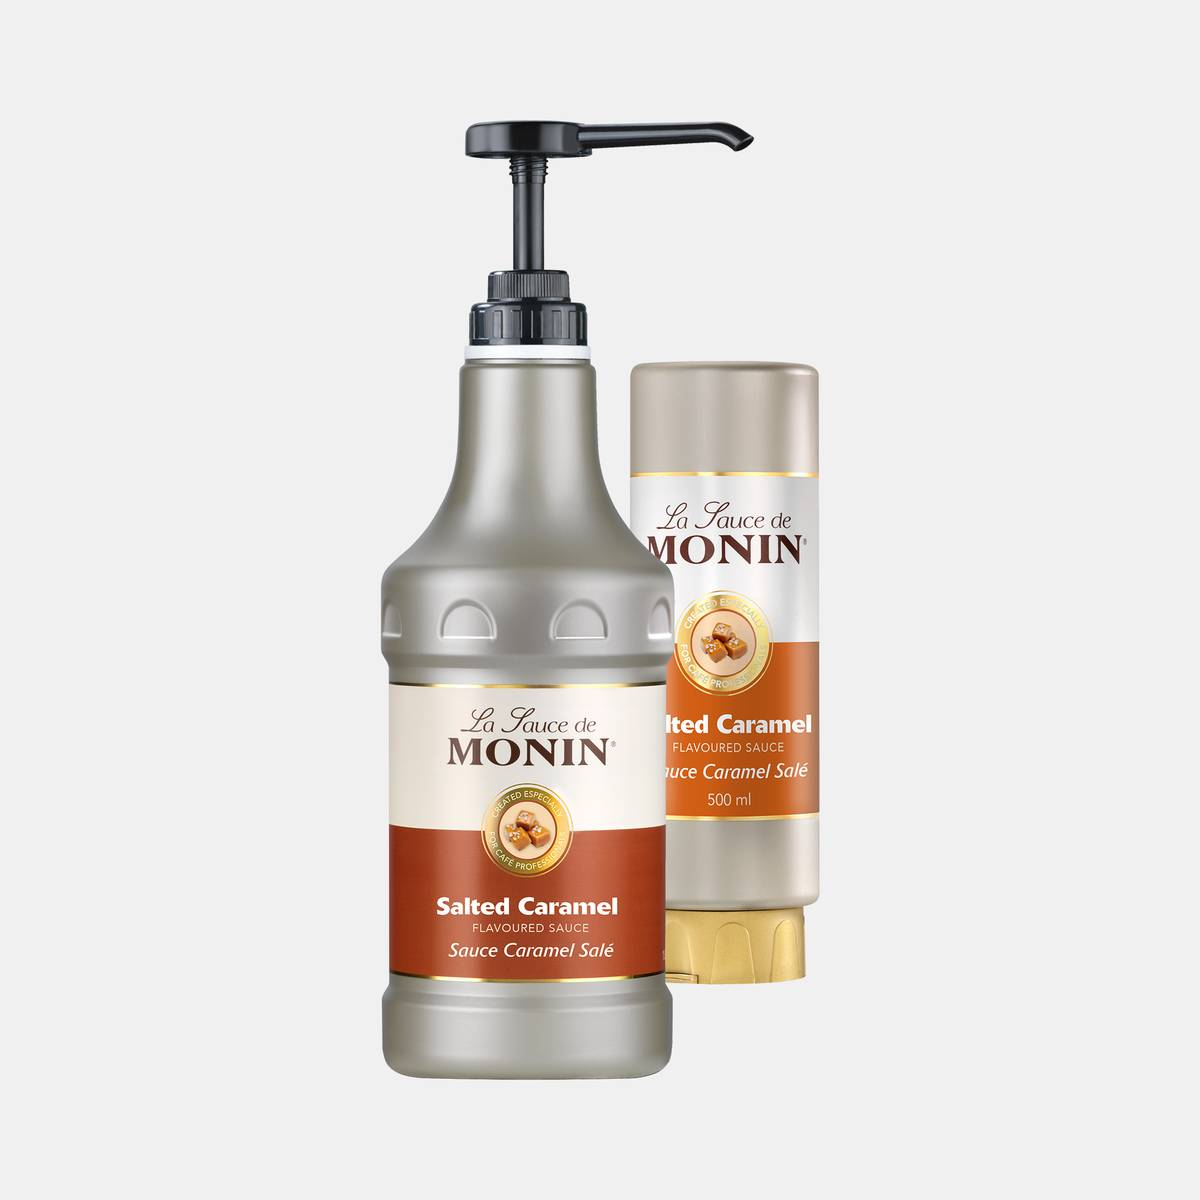 Monin Salted Caramel Sauce